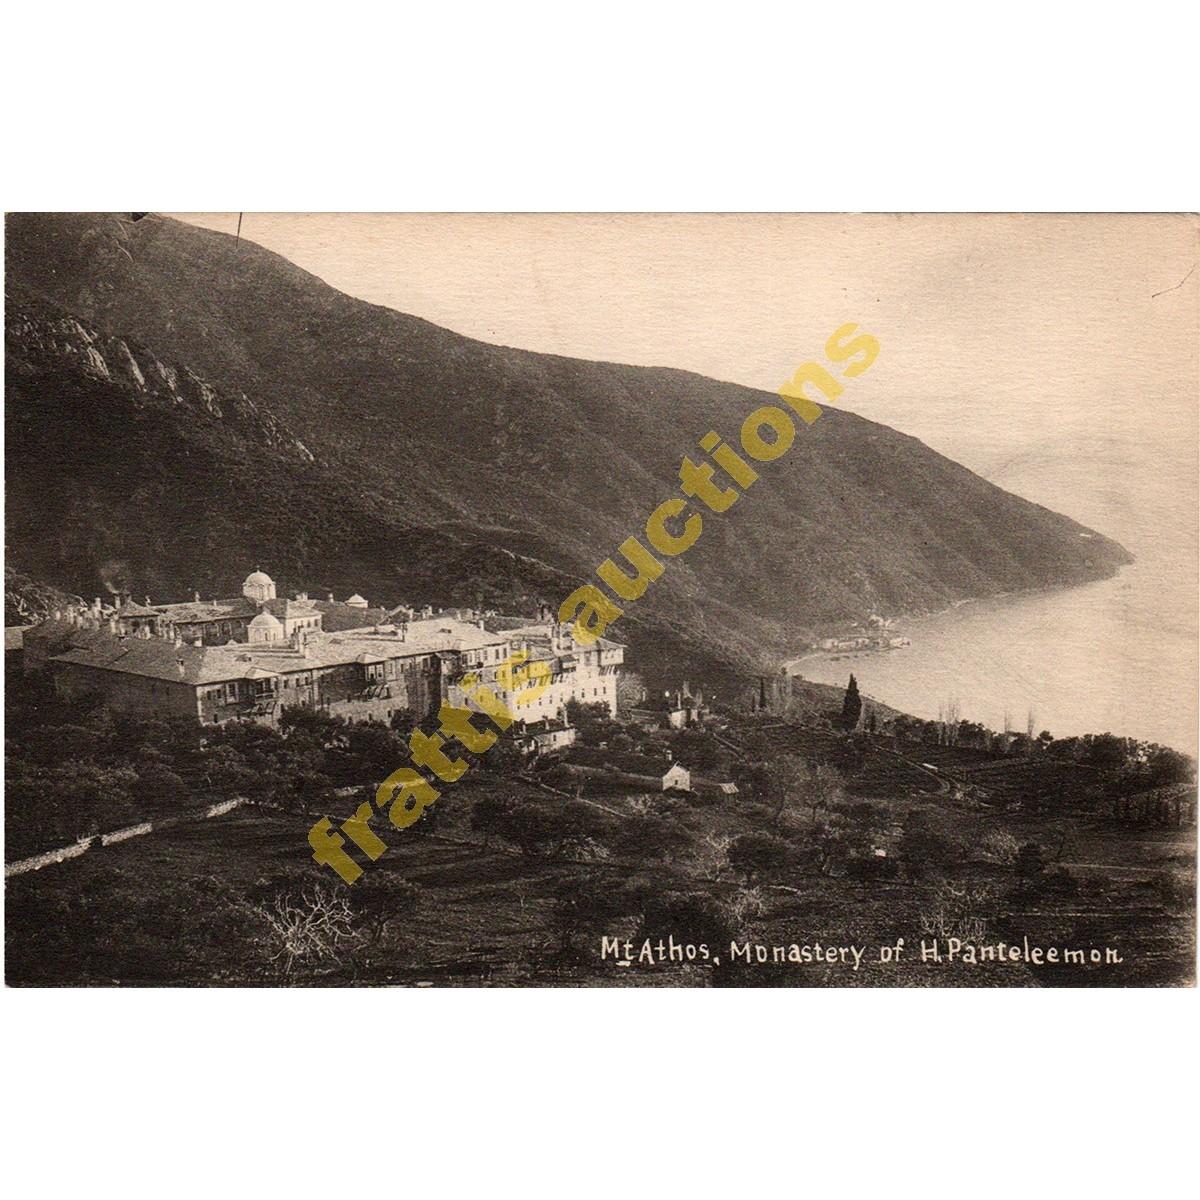 Mt Athos, Monastery of H. Panteleemon